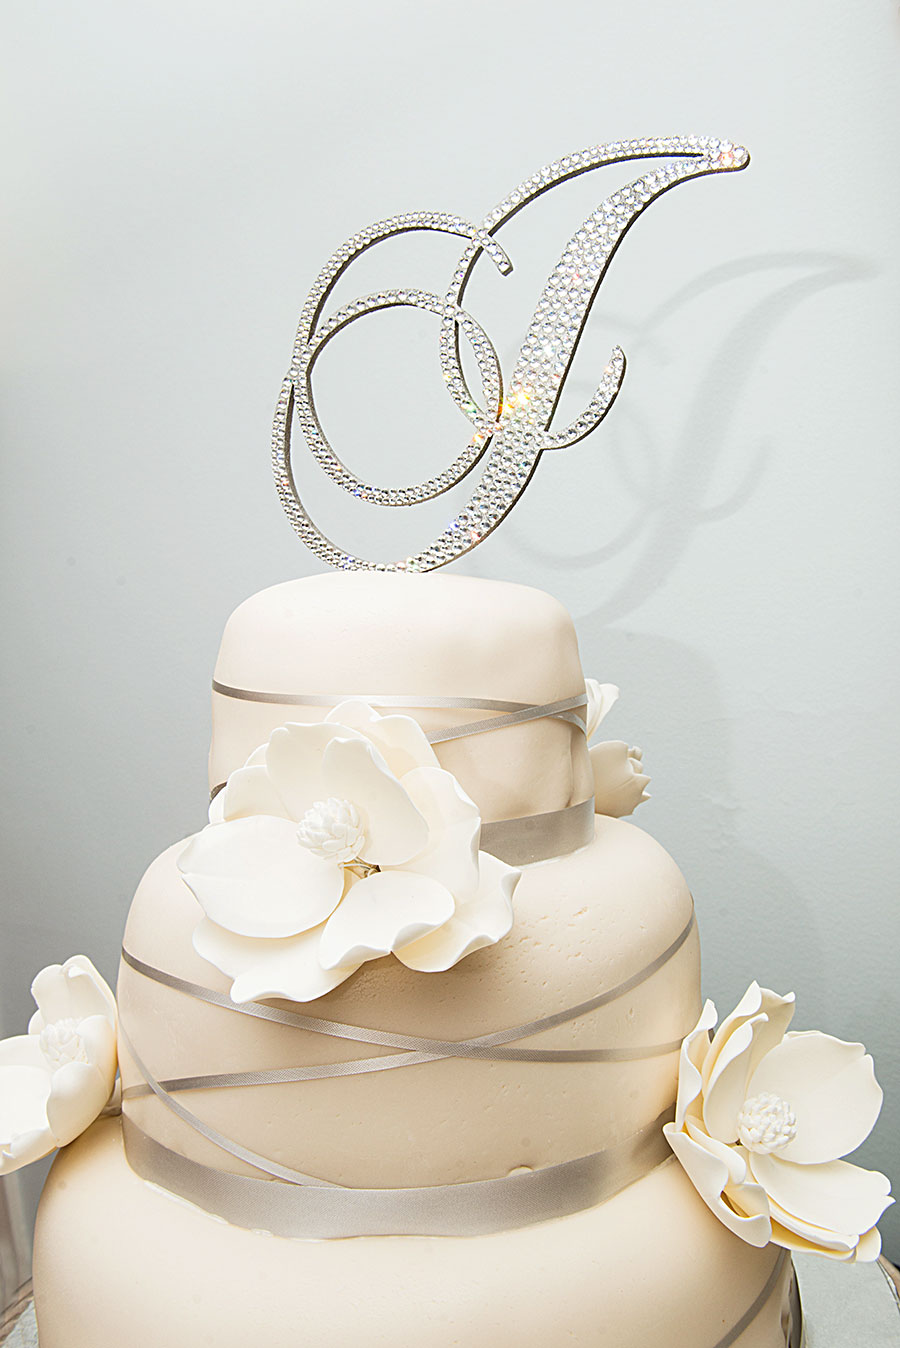 johnson-cake